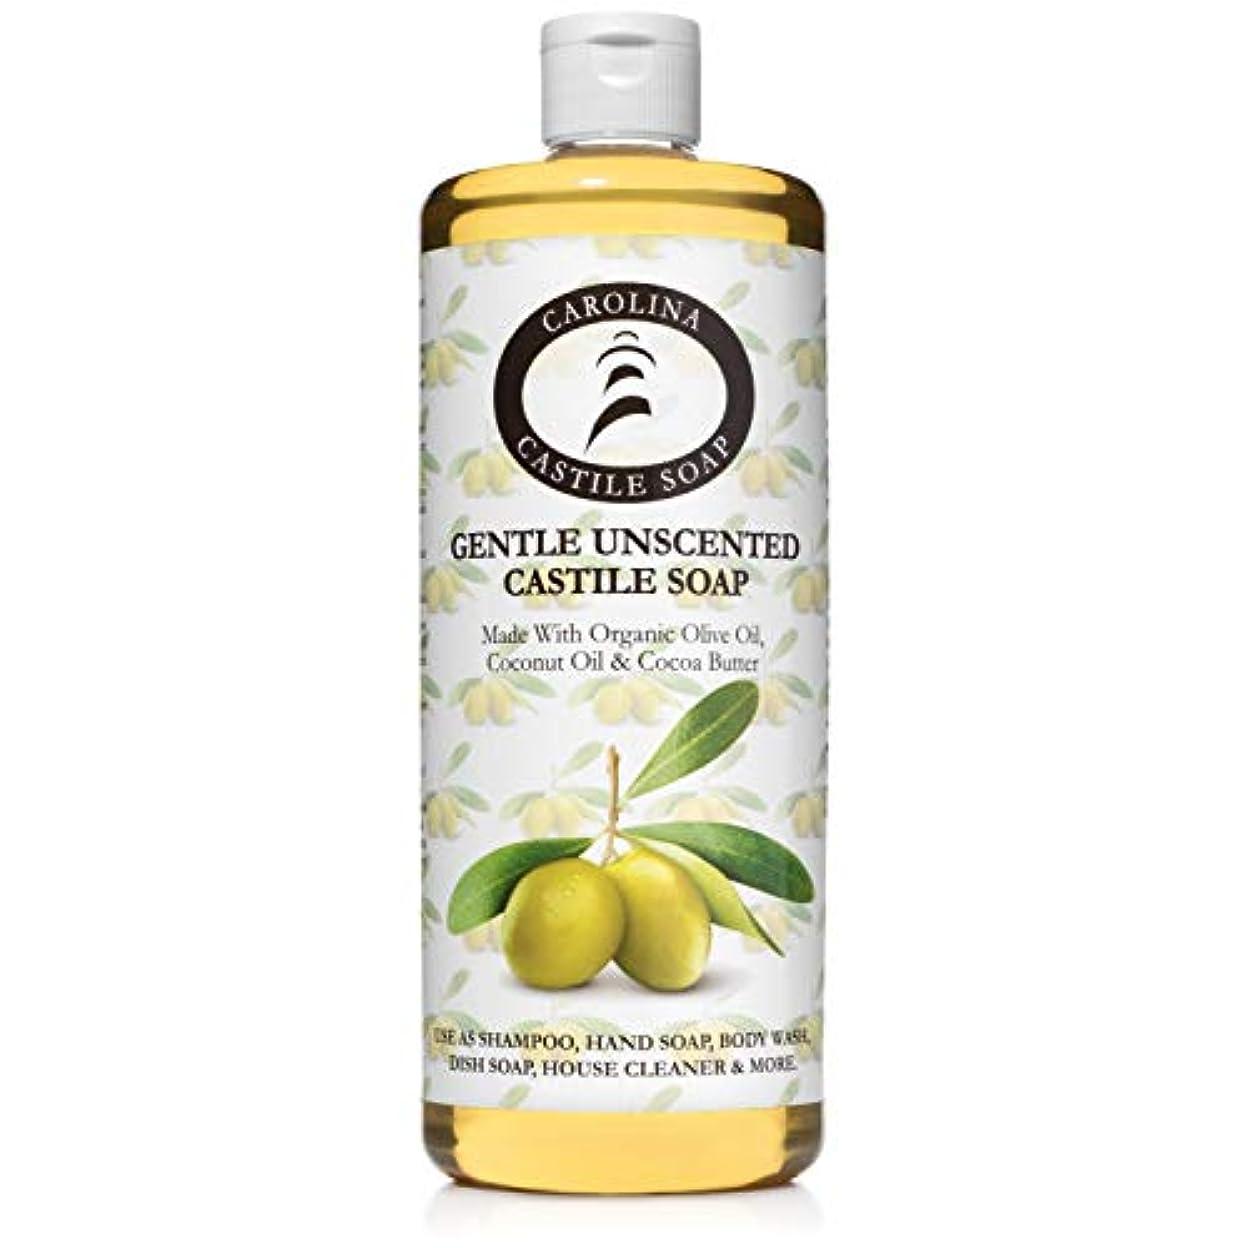 Carolina Castile Soap ジェントル無香料認定オーガニック 32オズ